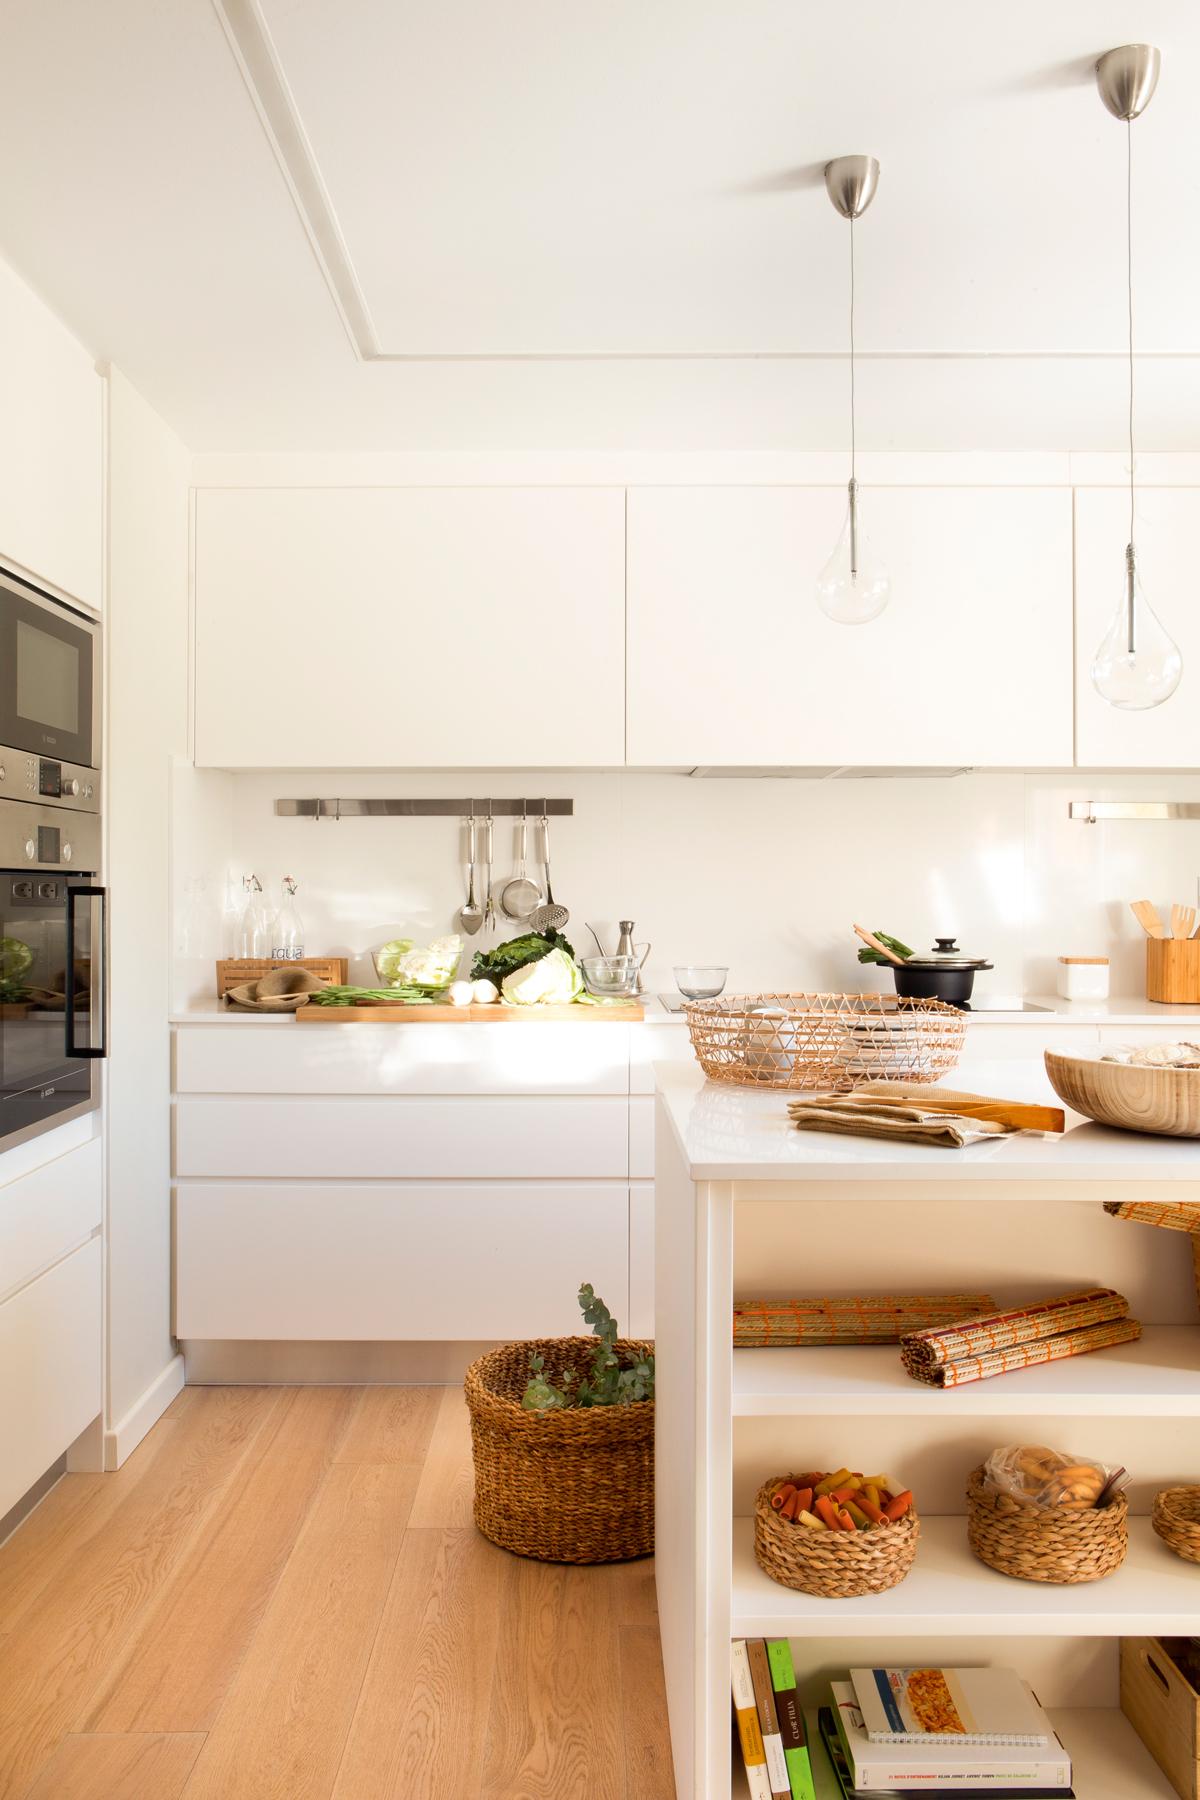 20 l mparas para decorar toda tu casa for Como modernizar una cocina clasica